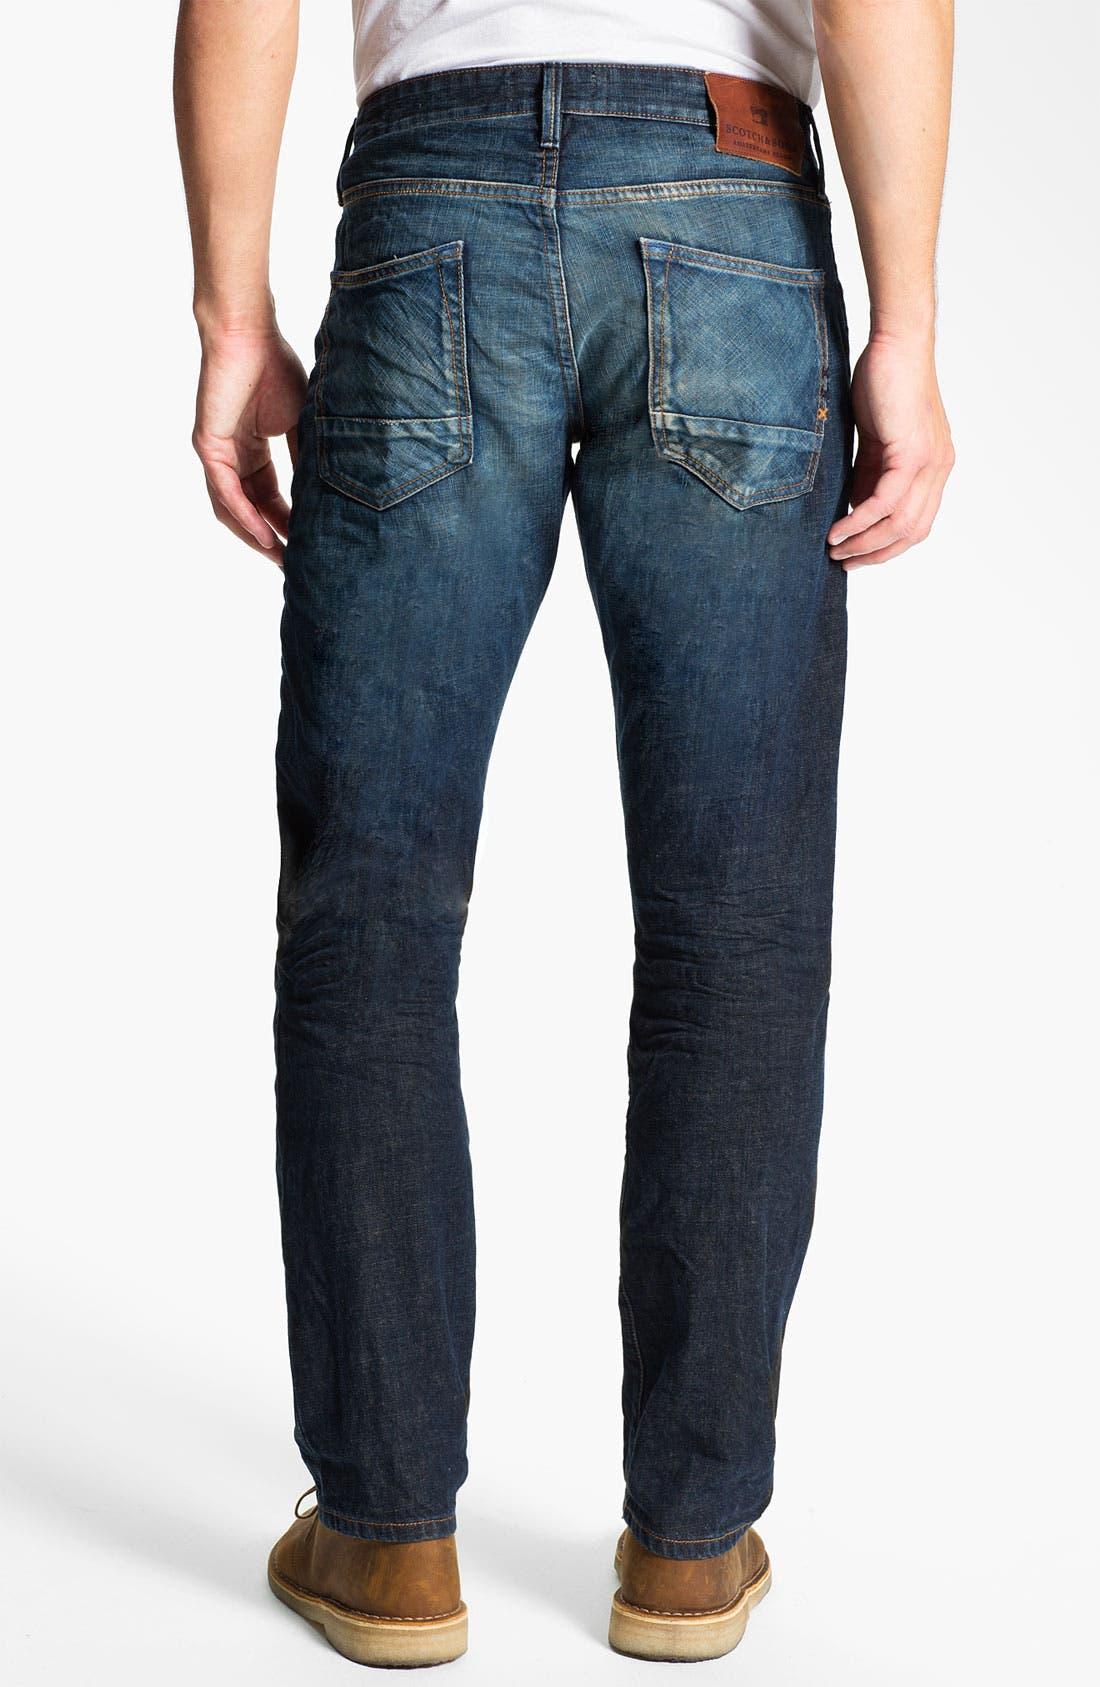 Alternate Image 1 Selected - Scotch & Soda 'Ralston' Slim Straight Leg Jeans (Blue Buzz)